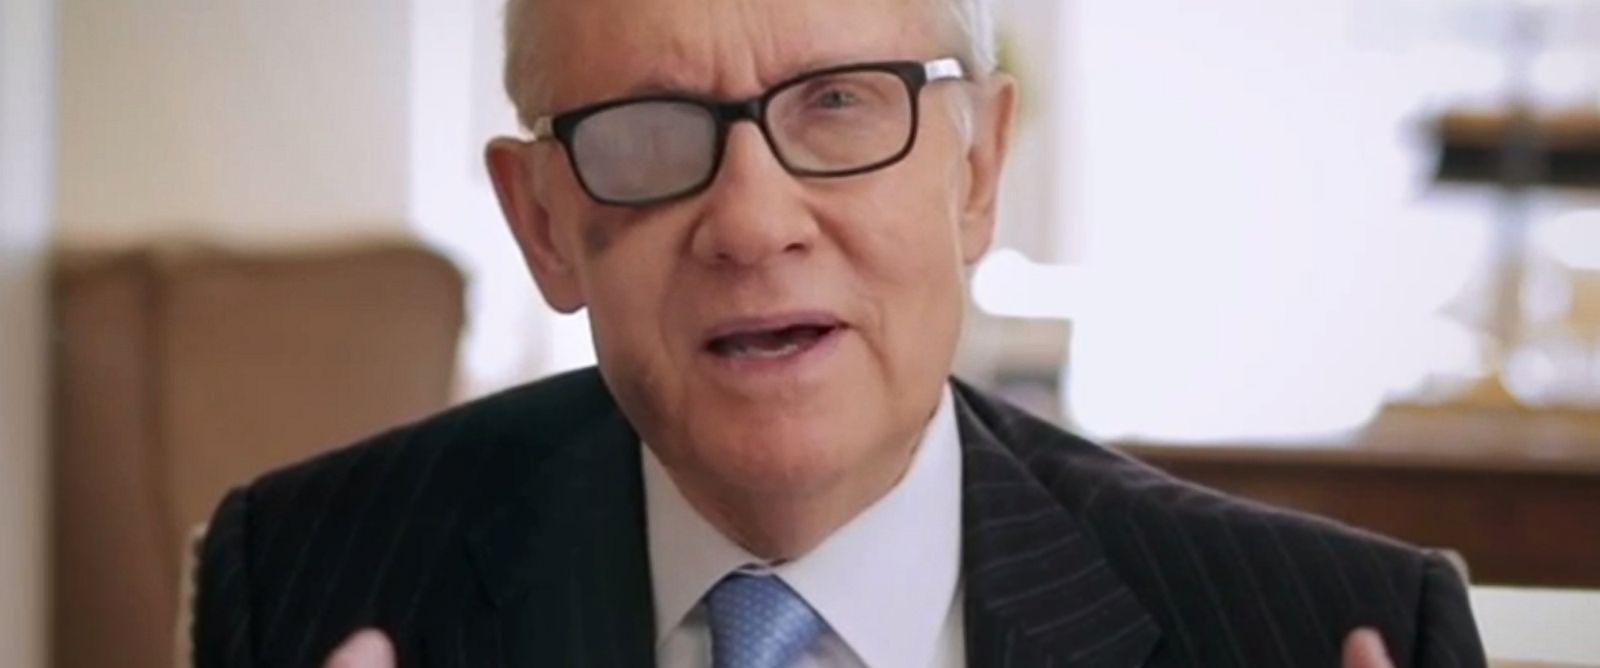 Harry Reid salary